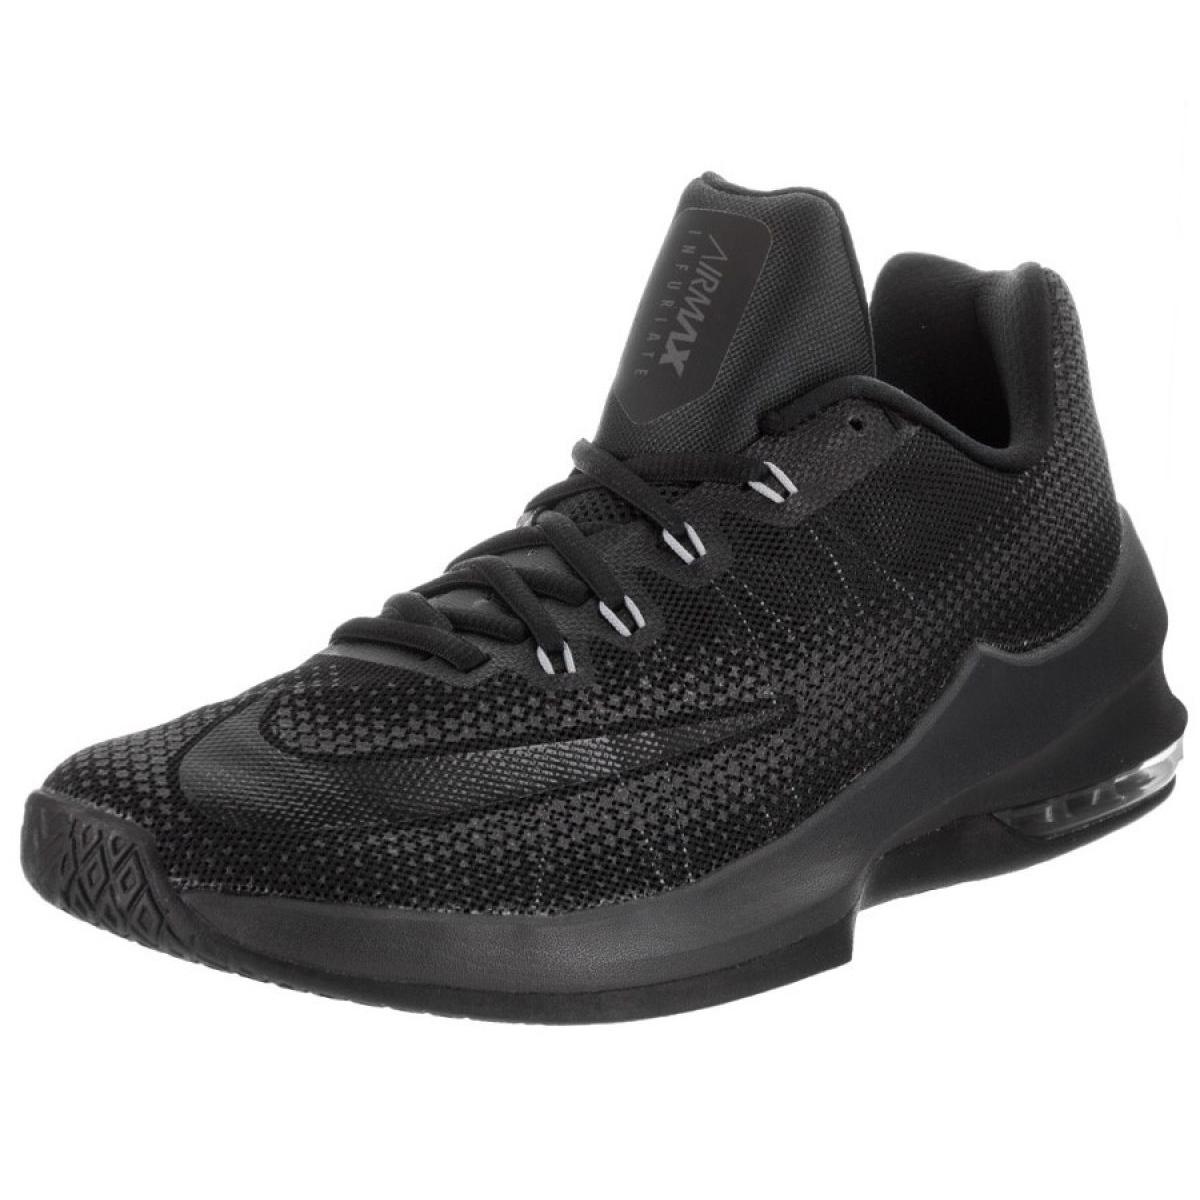 Tênis de basquete Nike Air Max Infuriate Baixa M 852457 001 preto preto